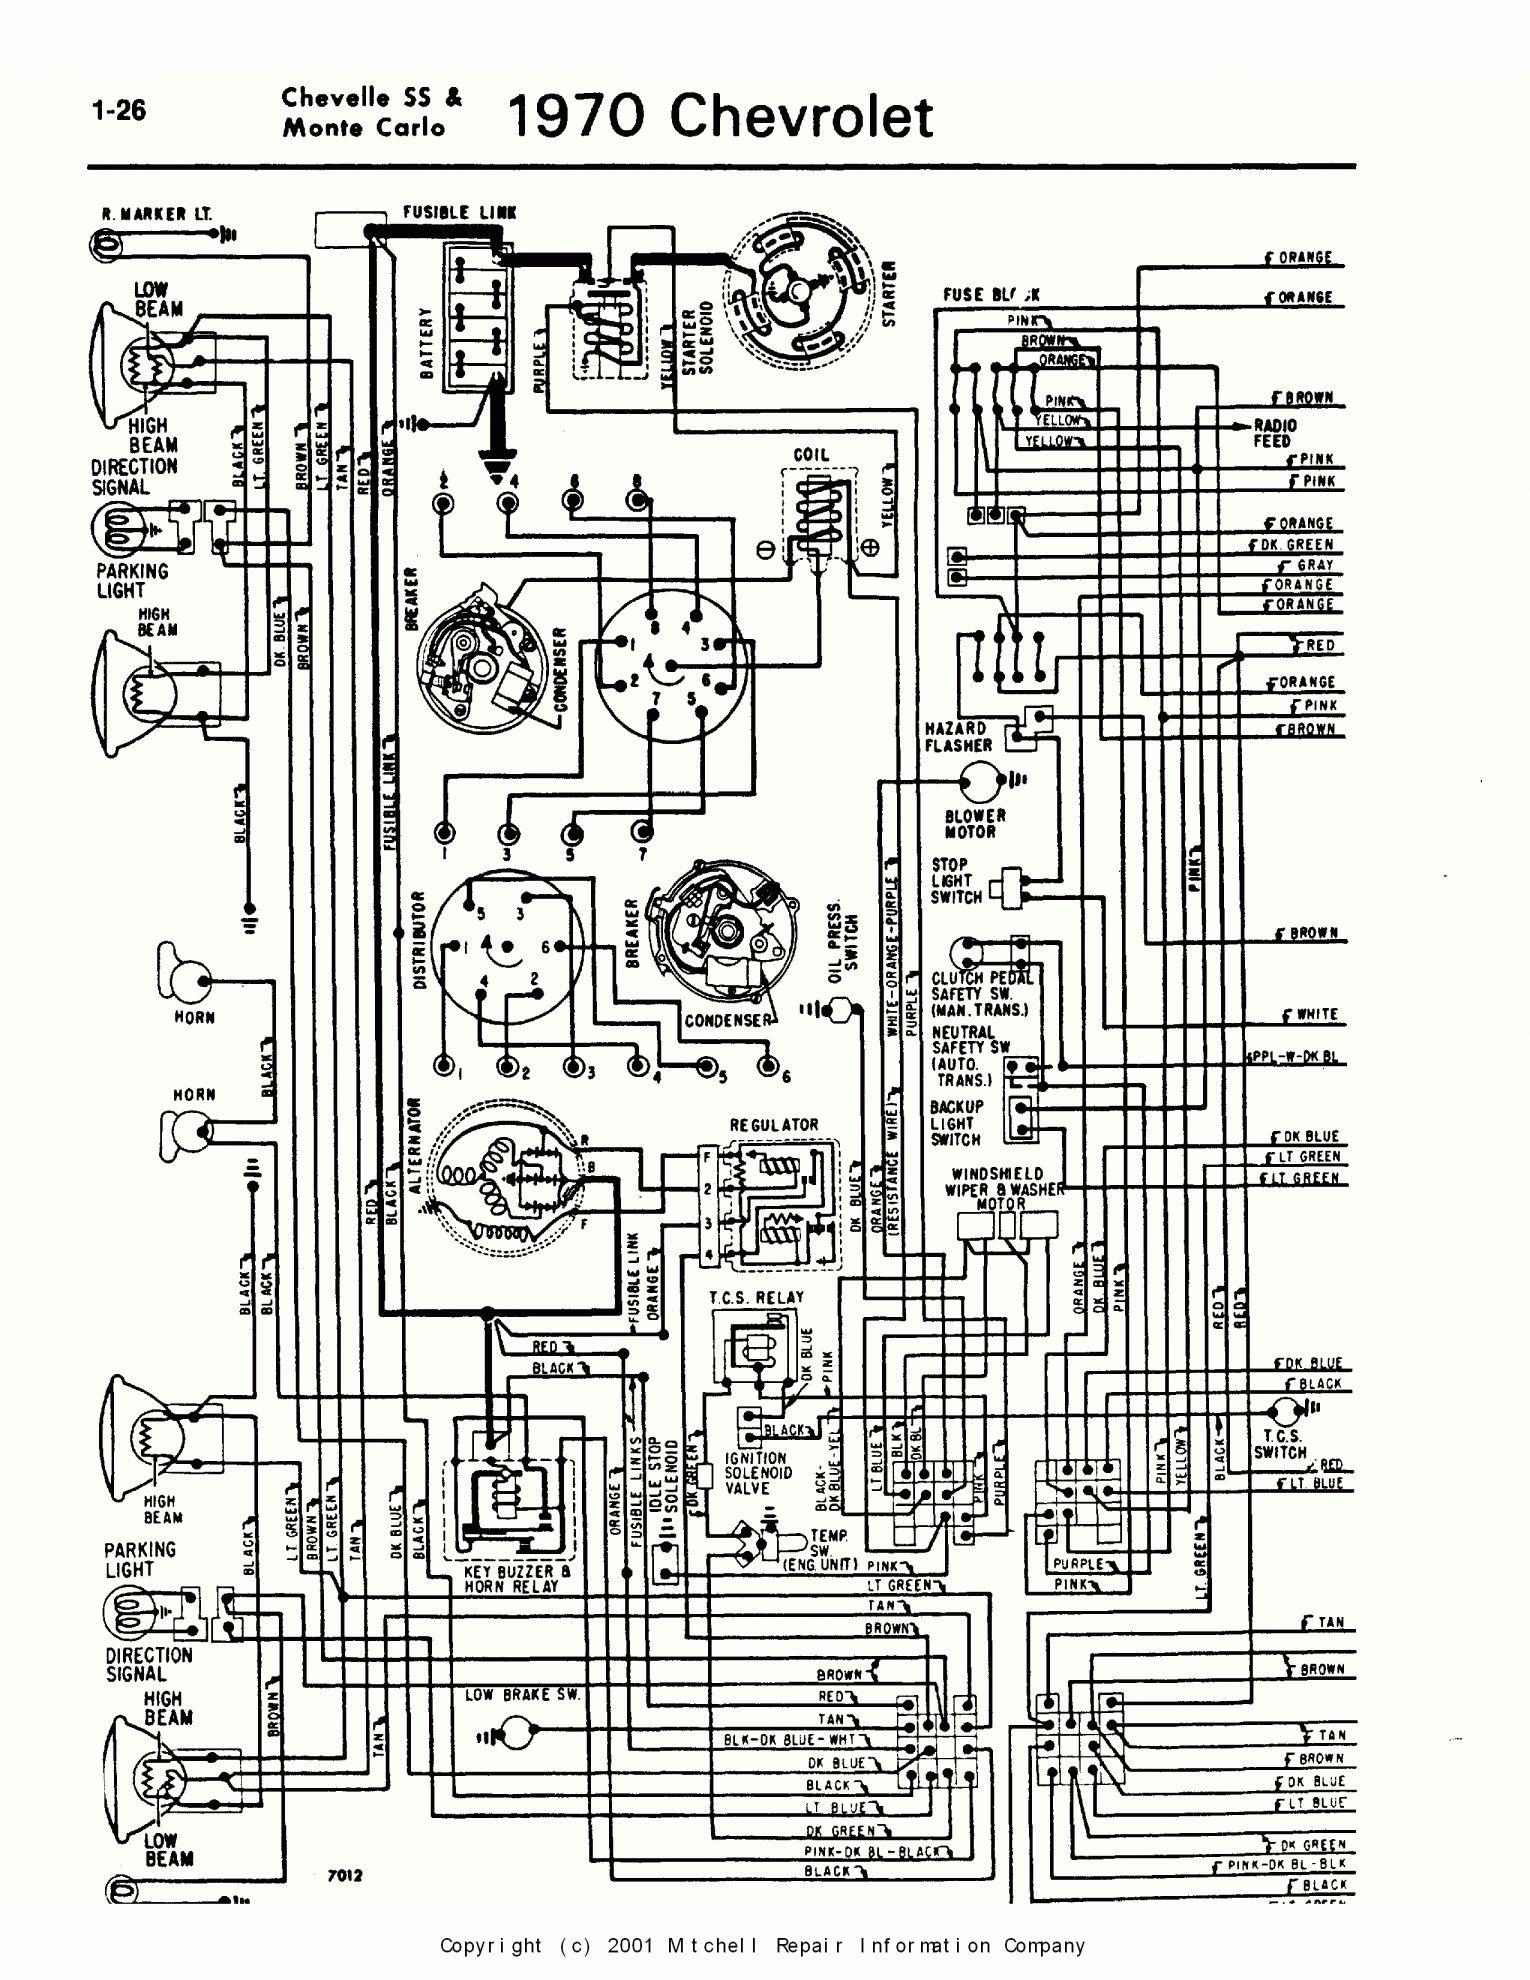 16 1969 Chevelle Engine Wiring Harness Diagram 1970 Chevelle Chevelle Wire